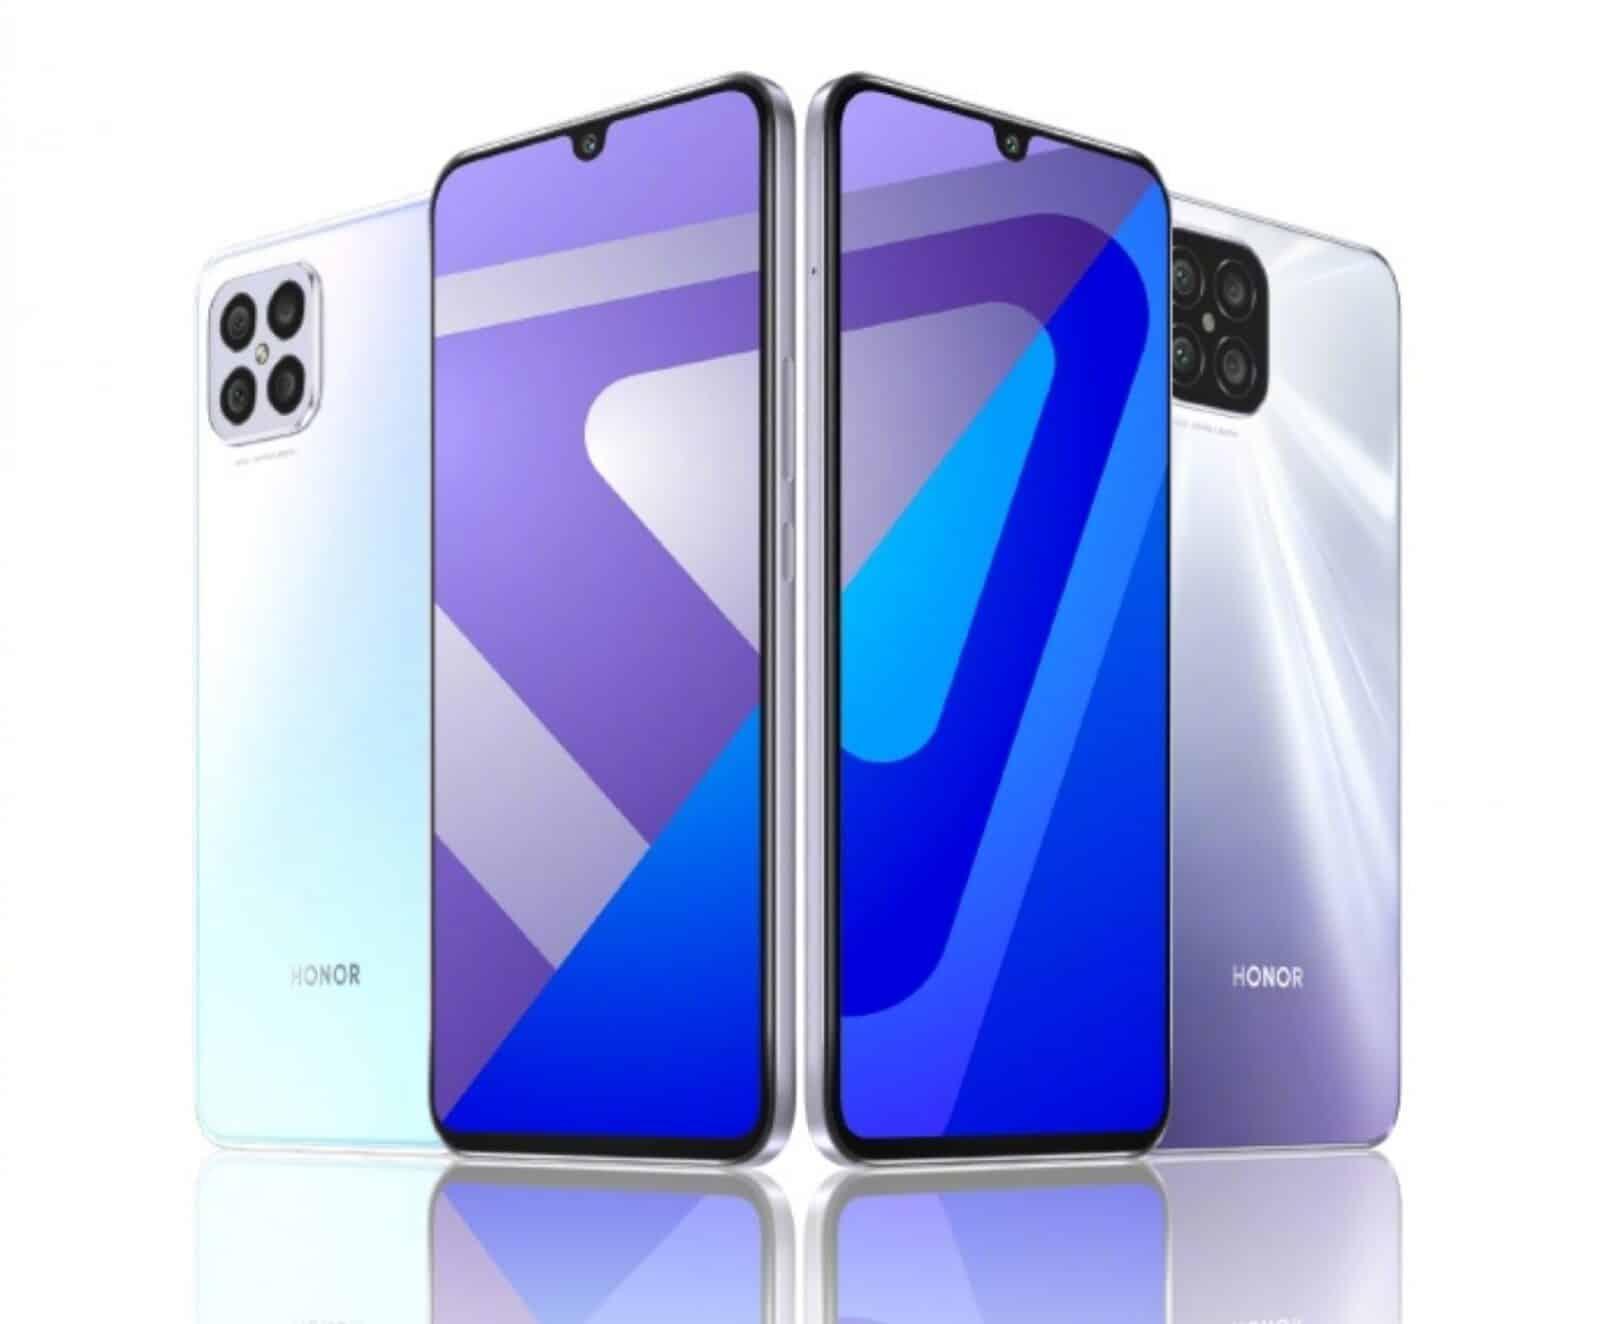 , Honor lance ses premiers smartphones sans Huawei